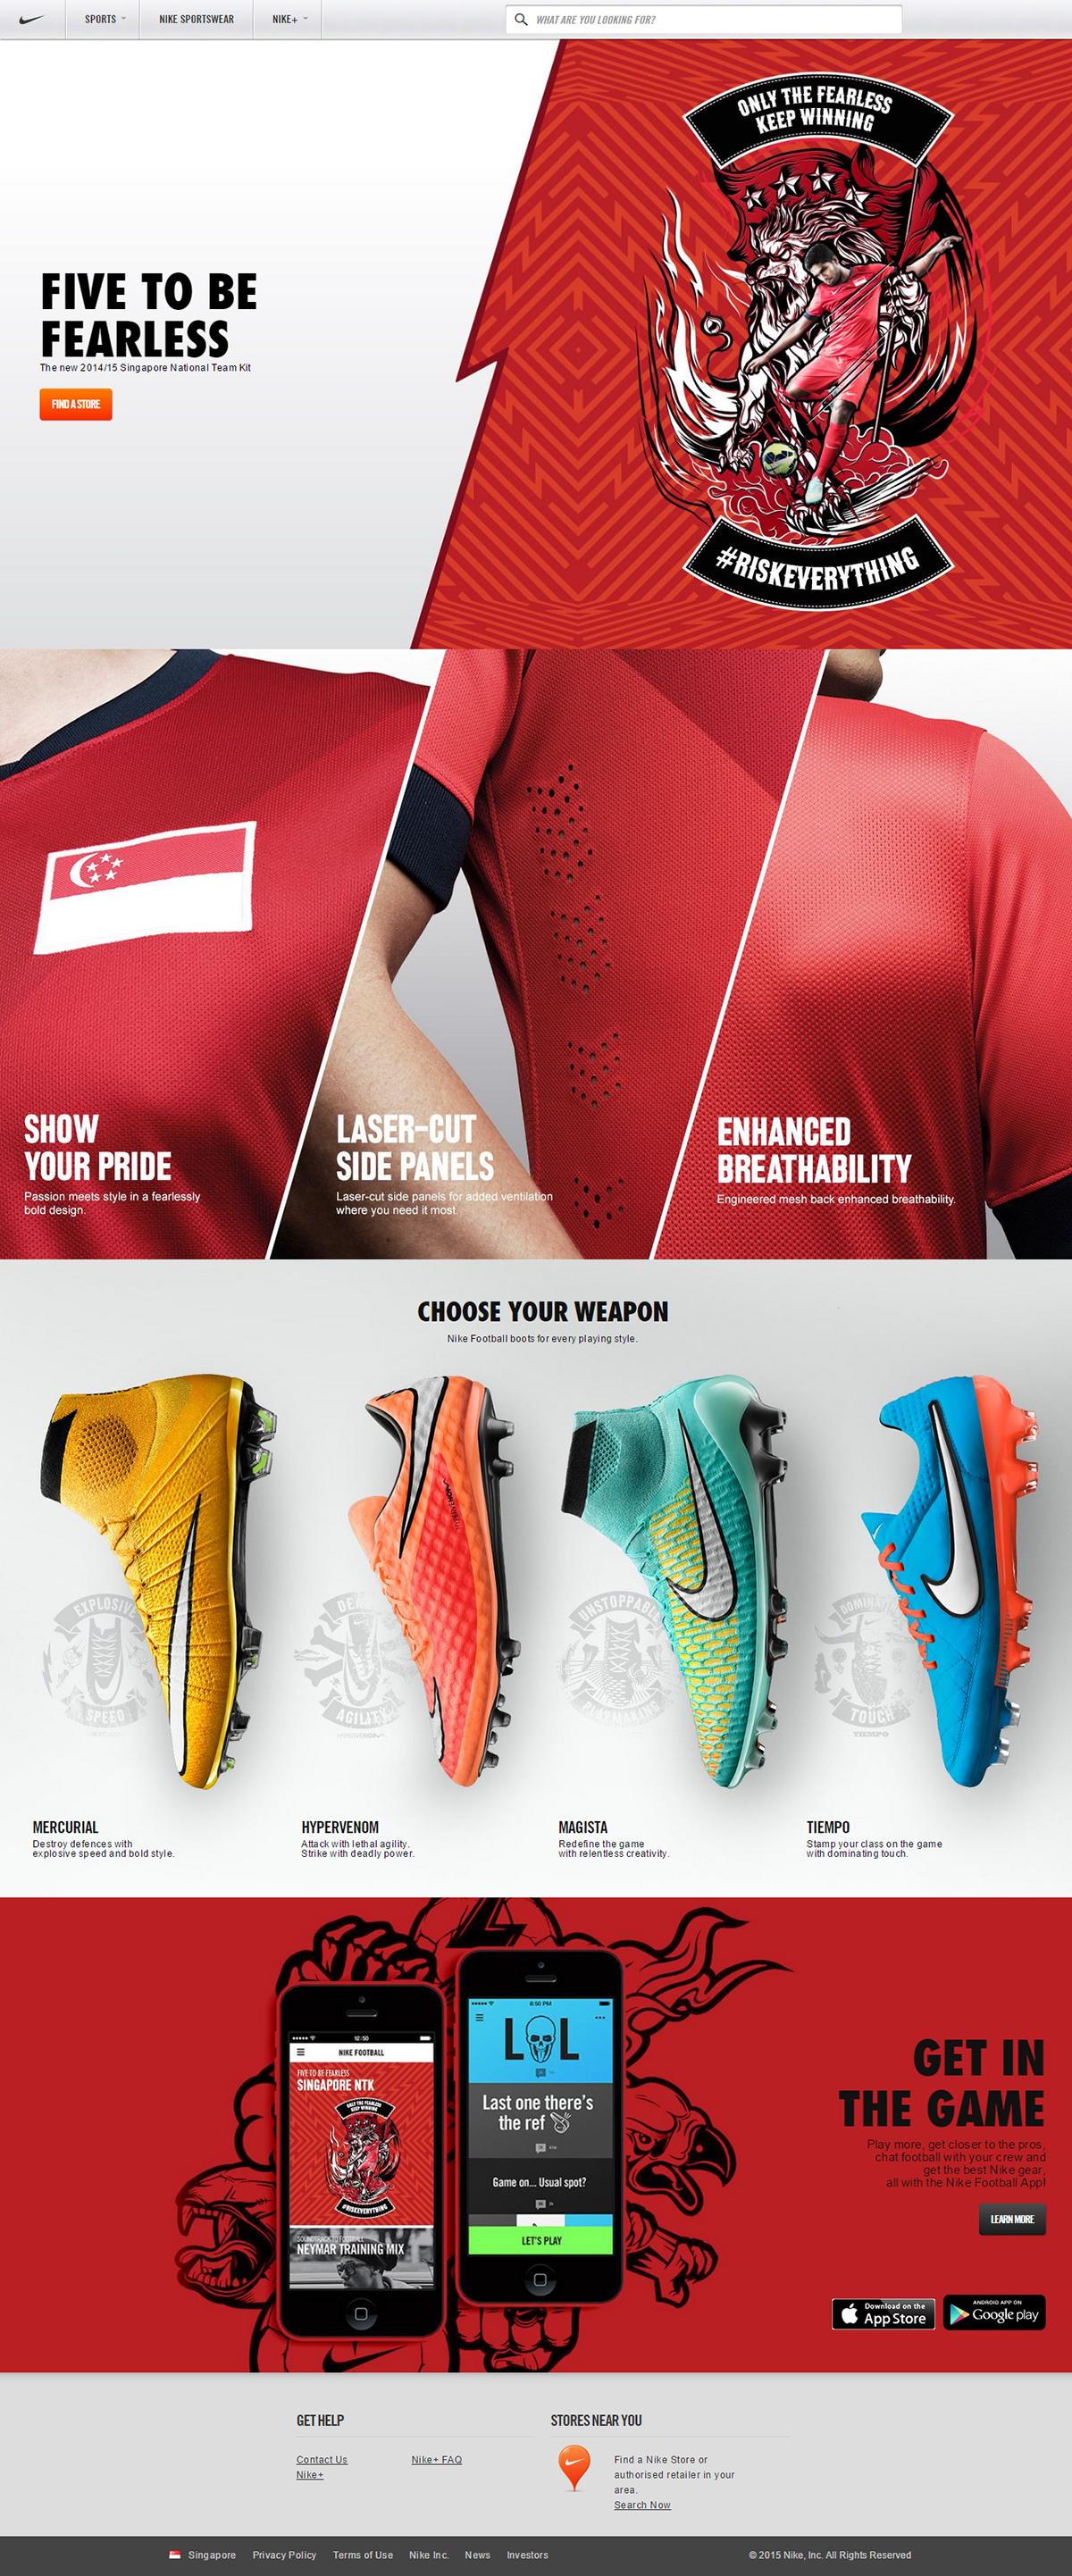 Nike nike football Nike Football Singapore Nike Football Malaysia Nike Football Indonesia Nike Football Thailand sports illustration football Vector Illustration BBH Asia Pacific